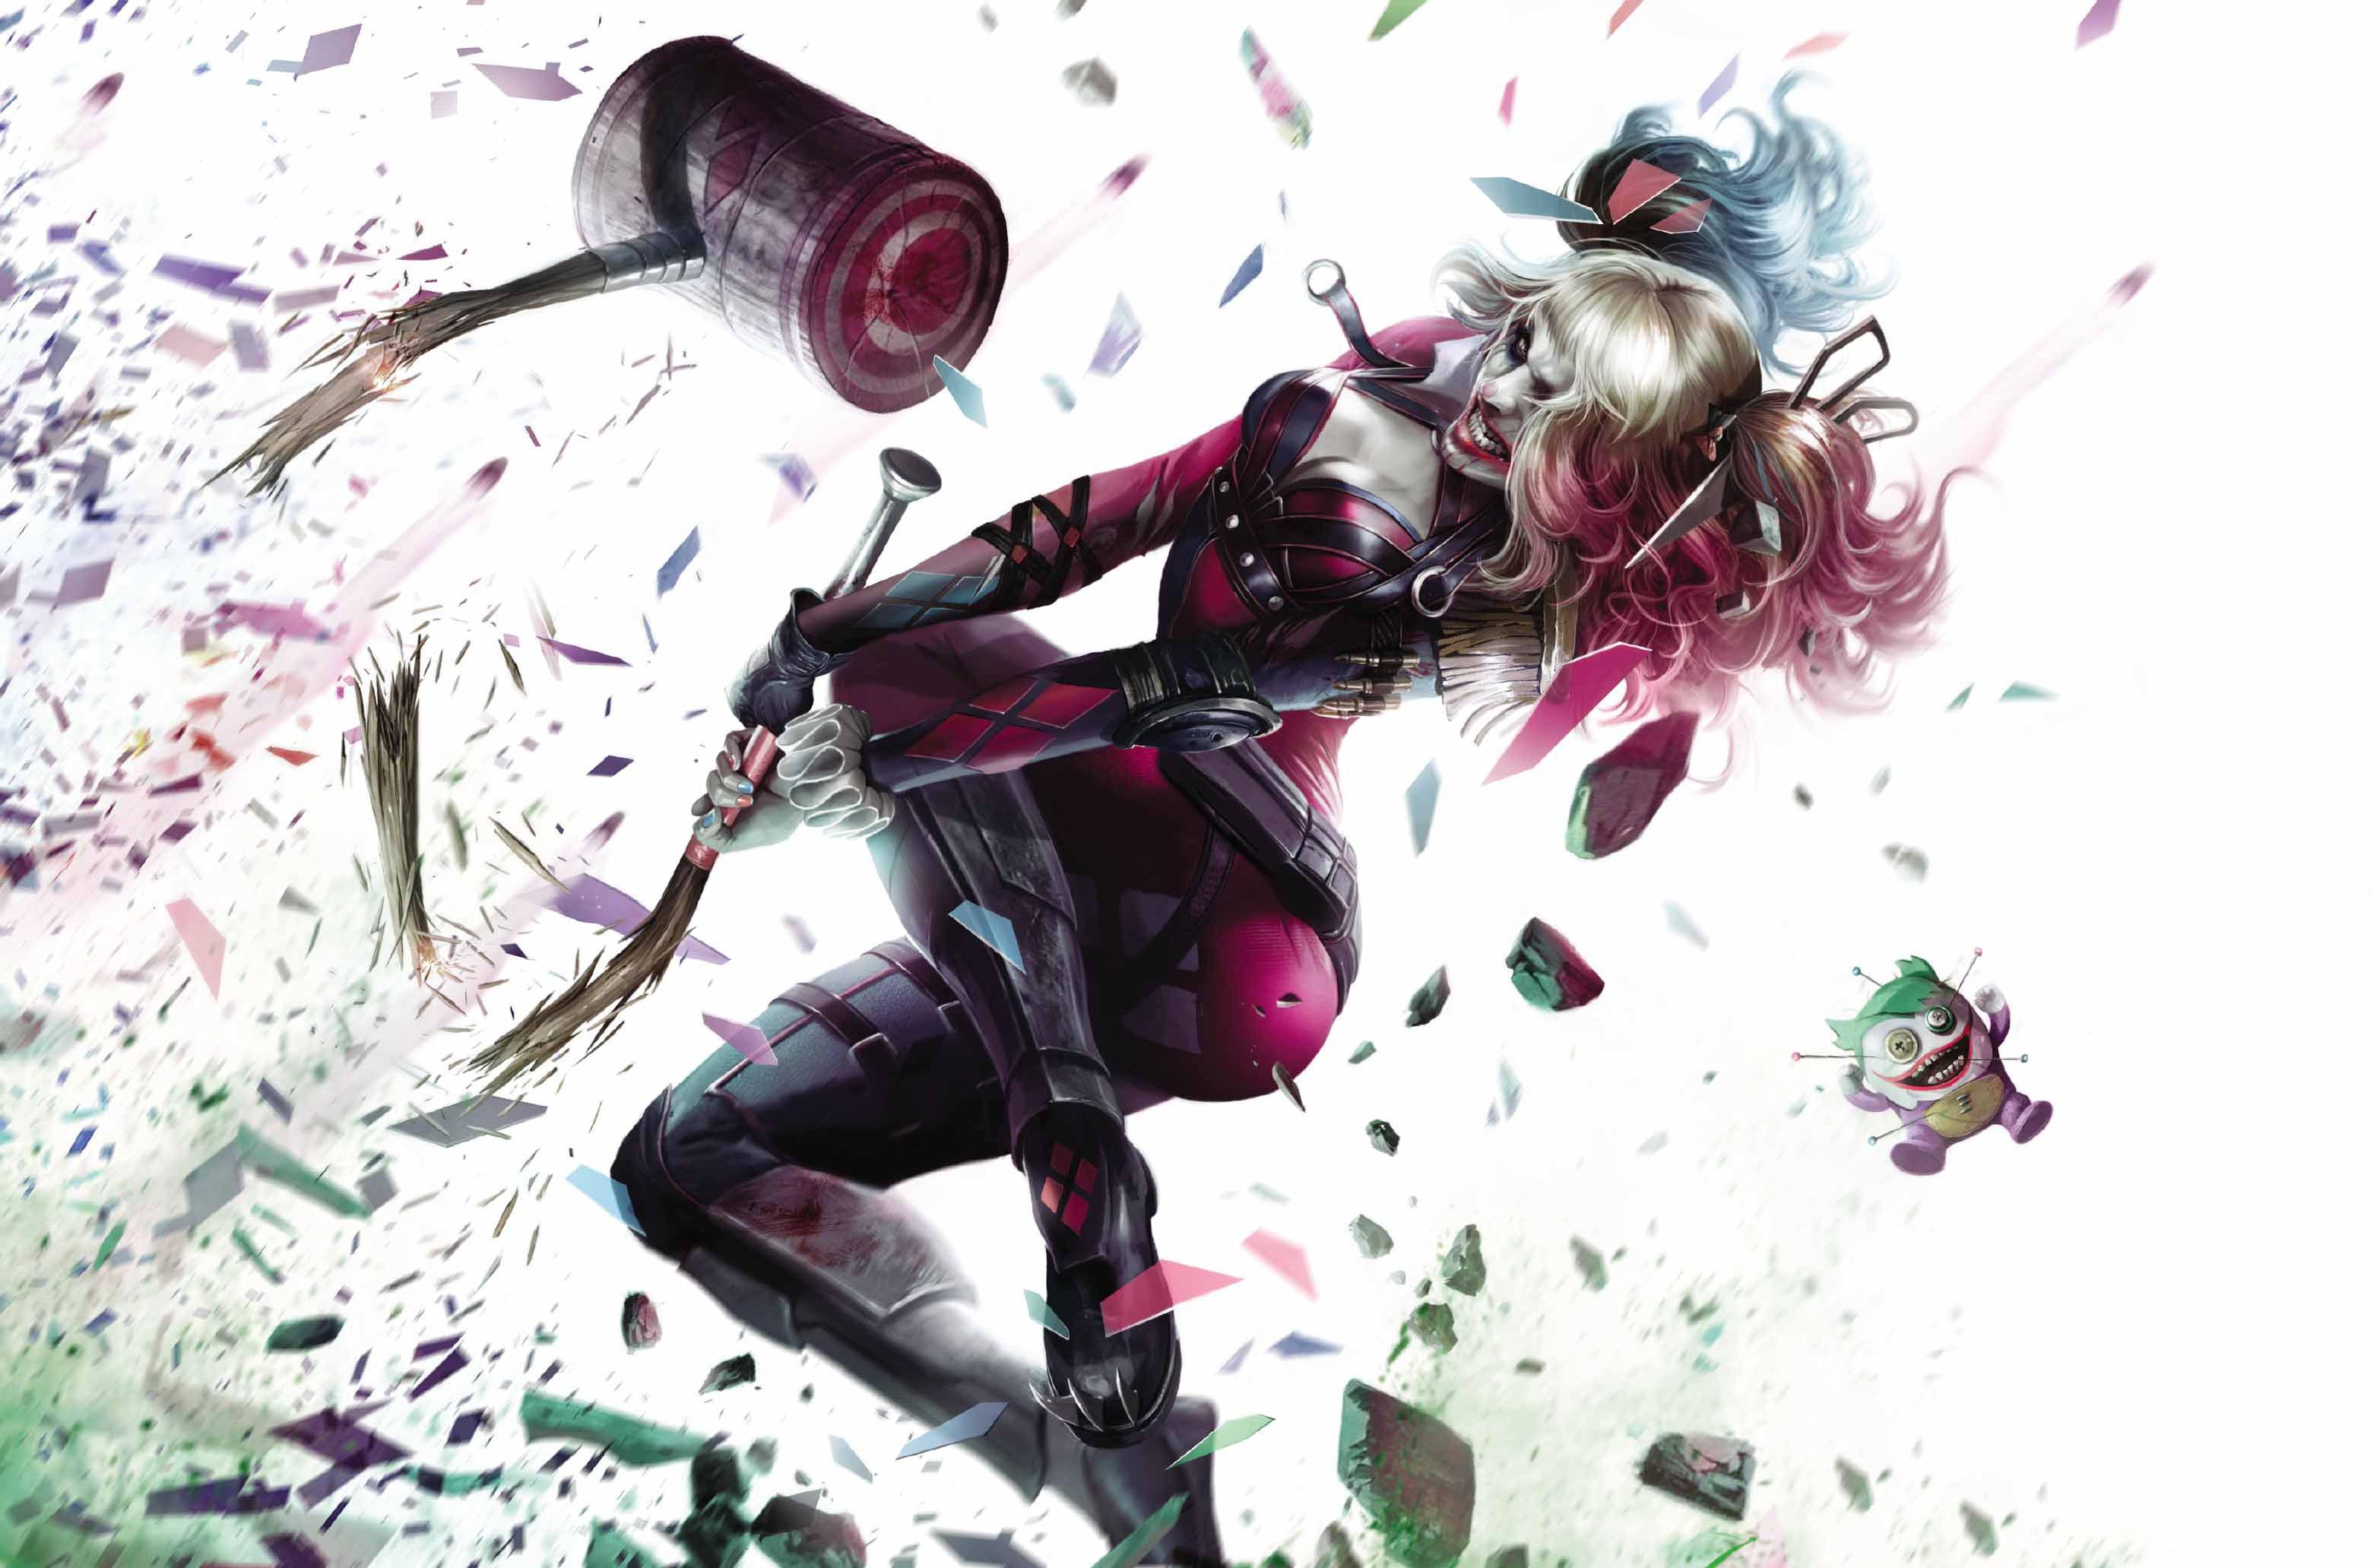 Harley Quinn Dc Art  Hd Superheroes  4k Wallpapers  Images